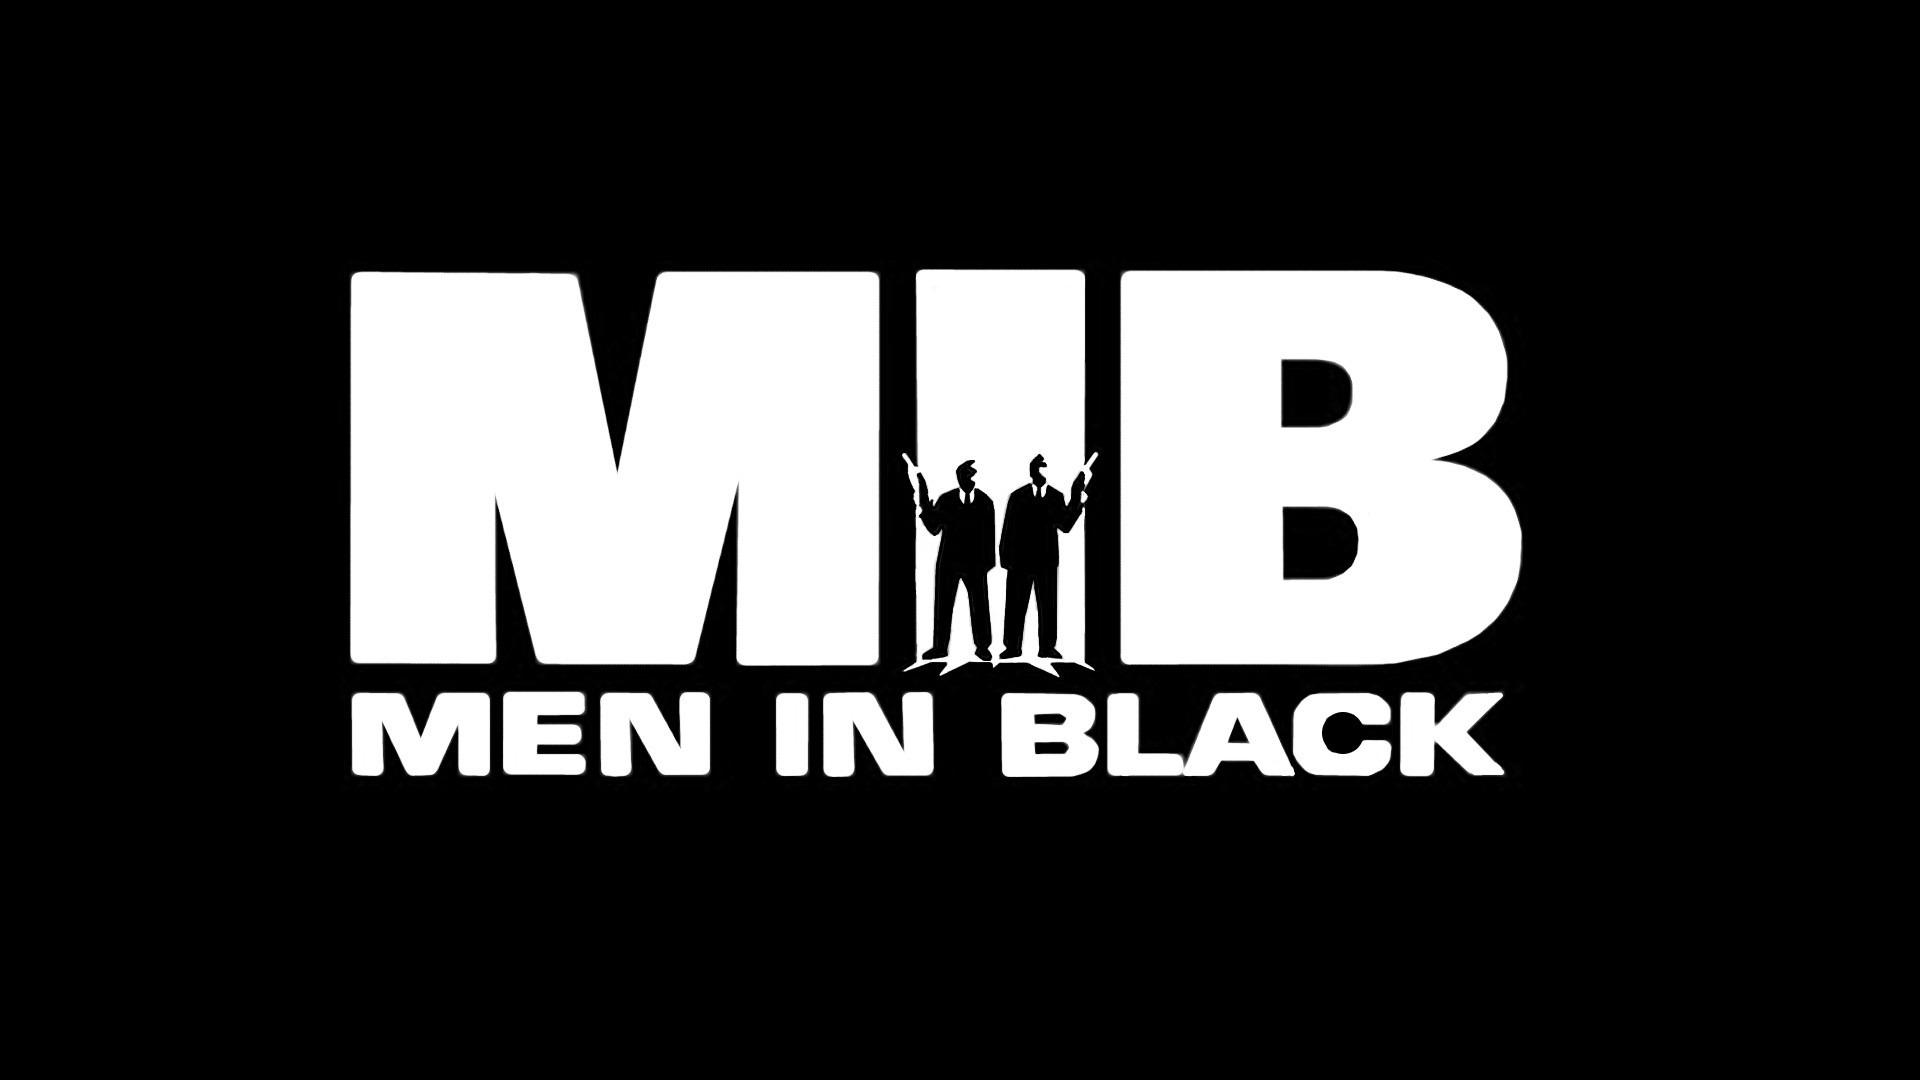 Show Men in Black: The Series